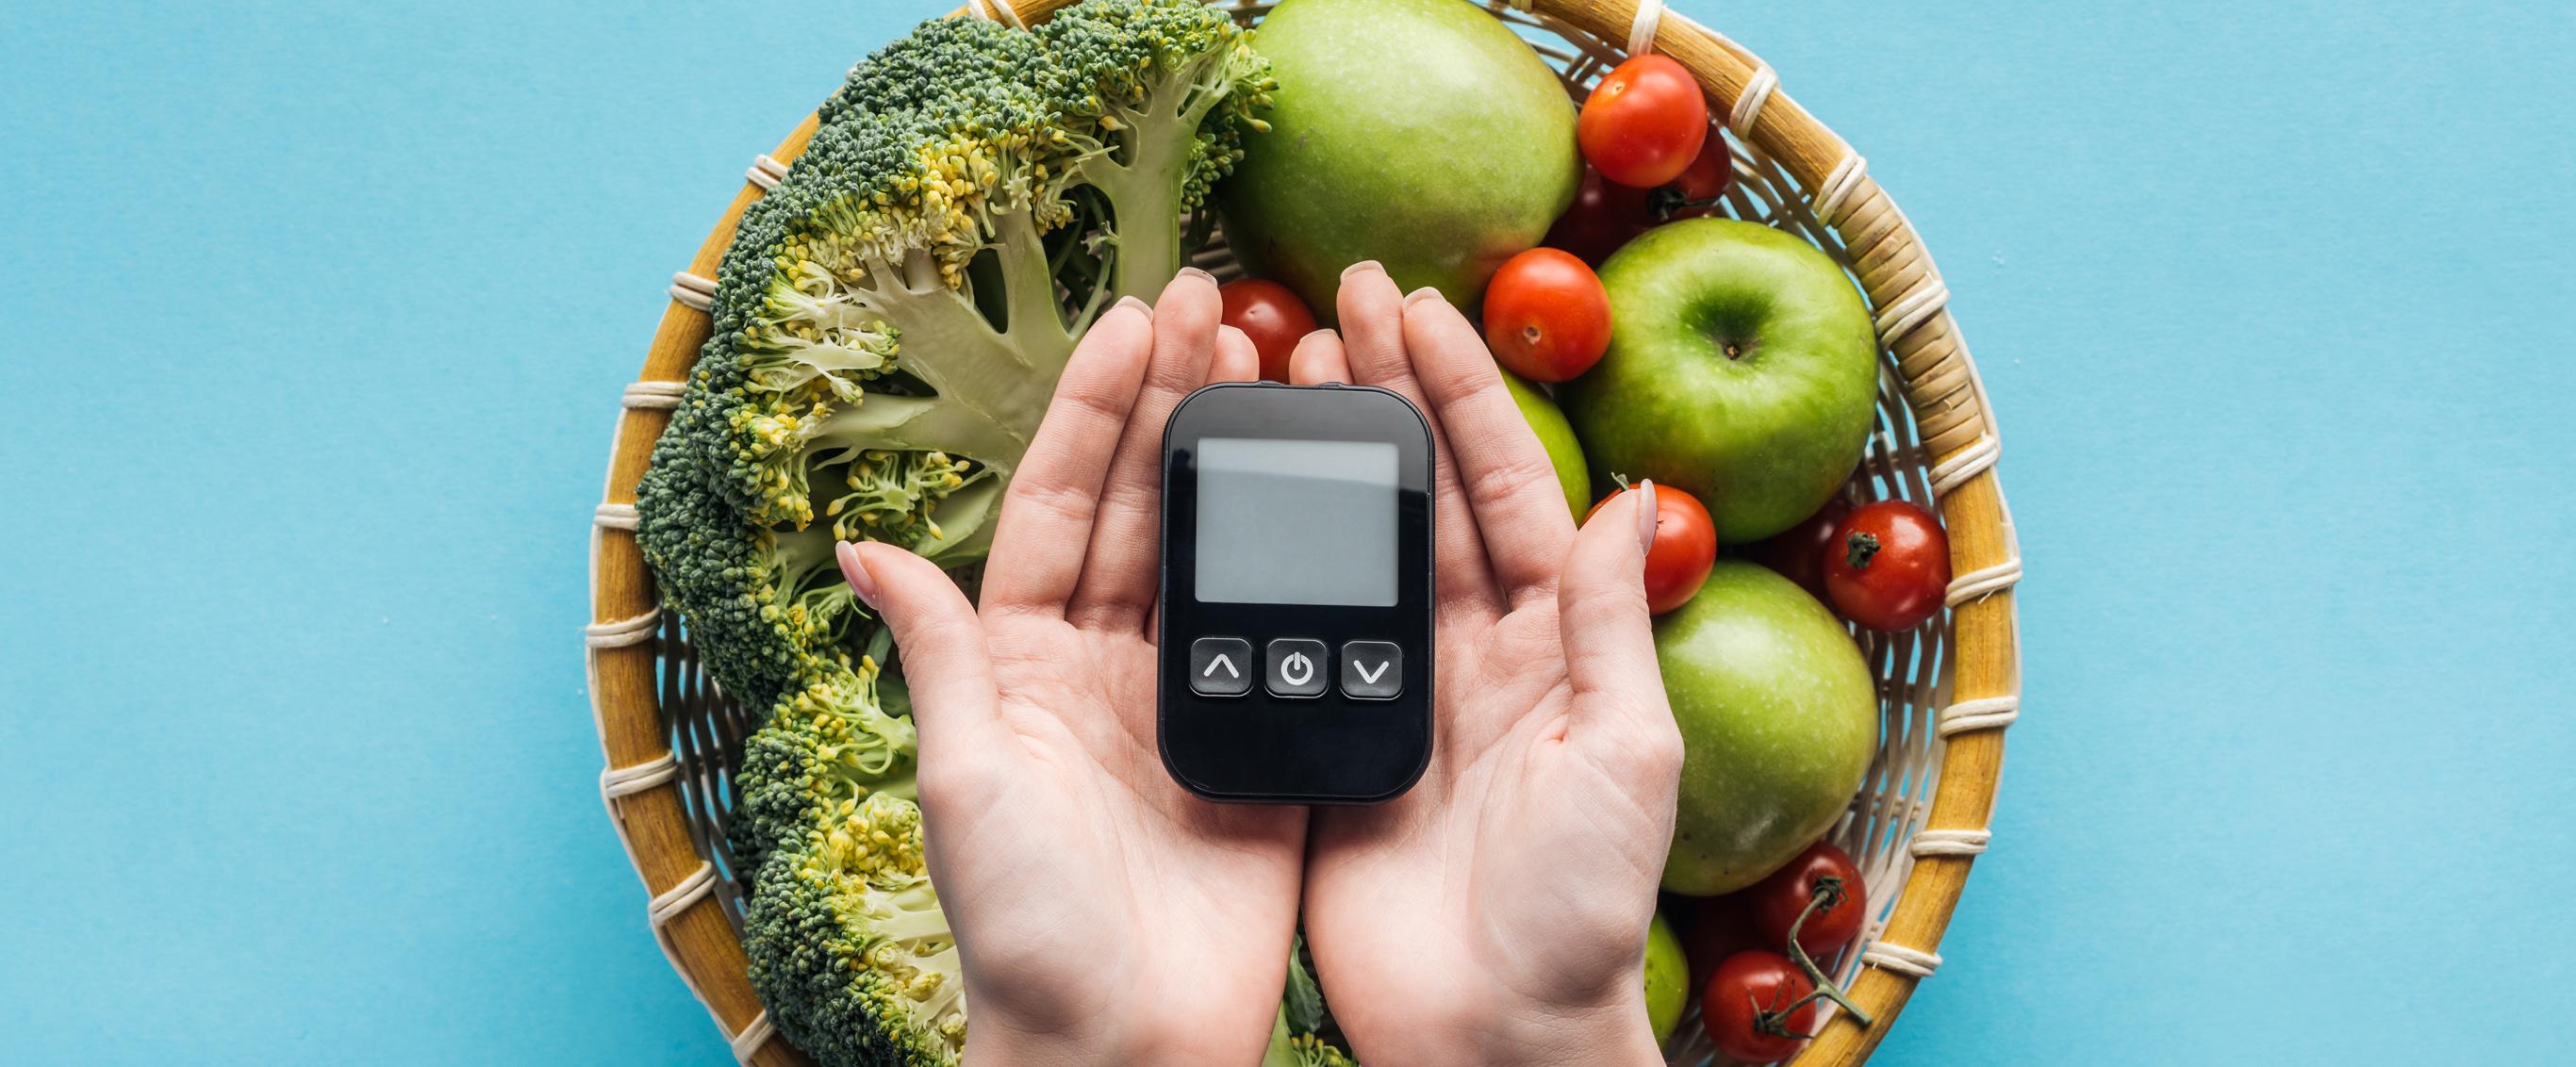 comidas veganas para recetas de diabetes tipo 2